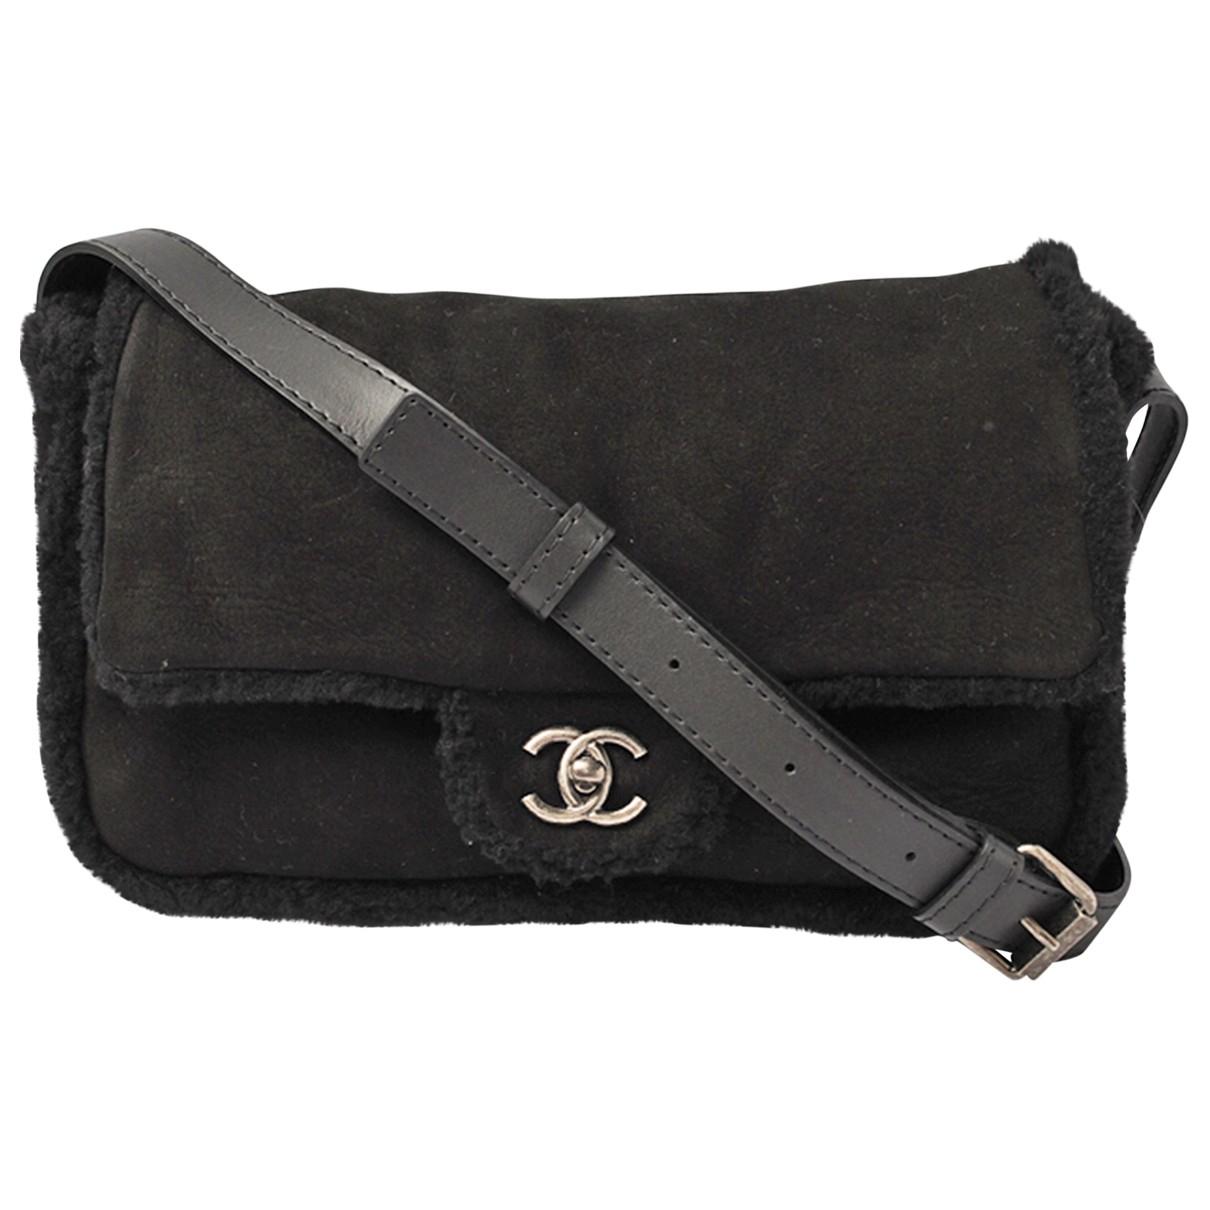 Chanel N Black Suede handbag for Women N